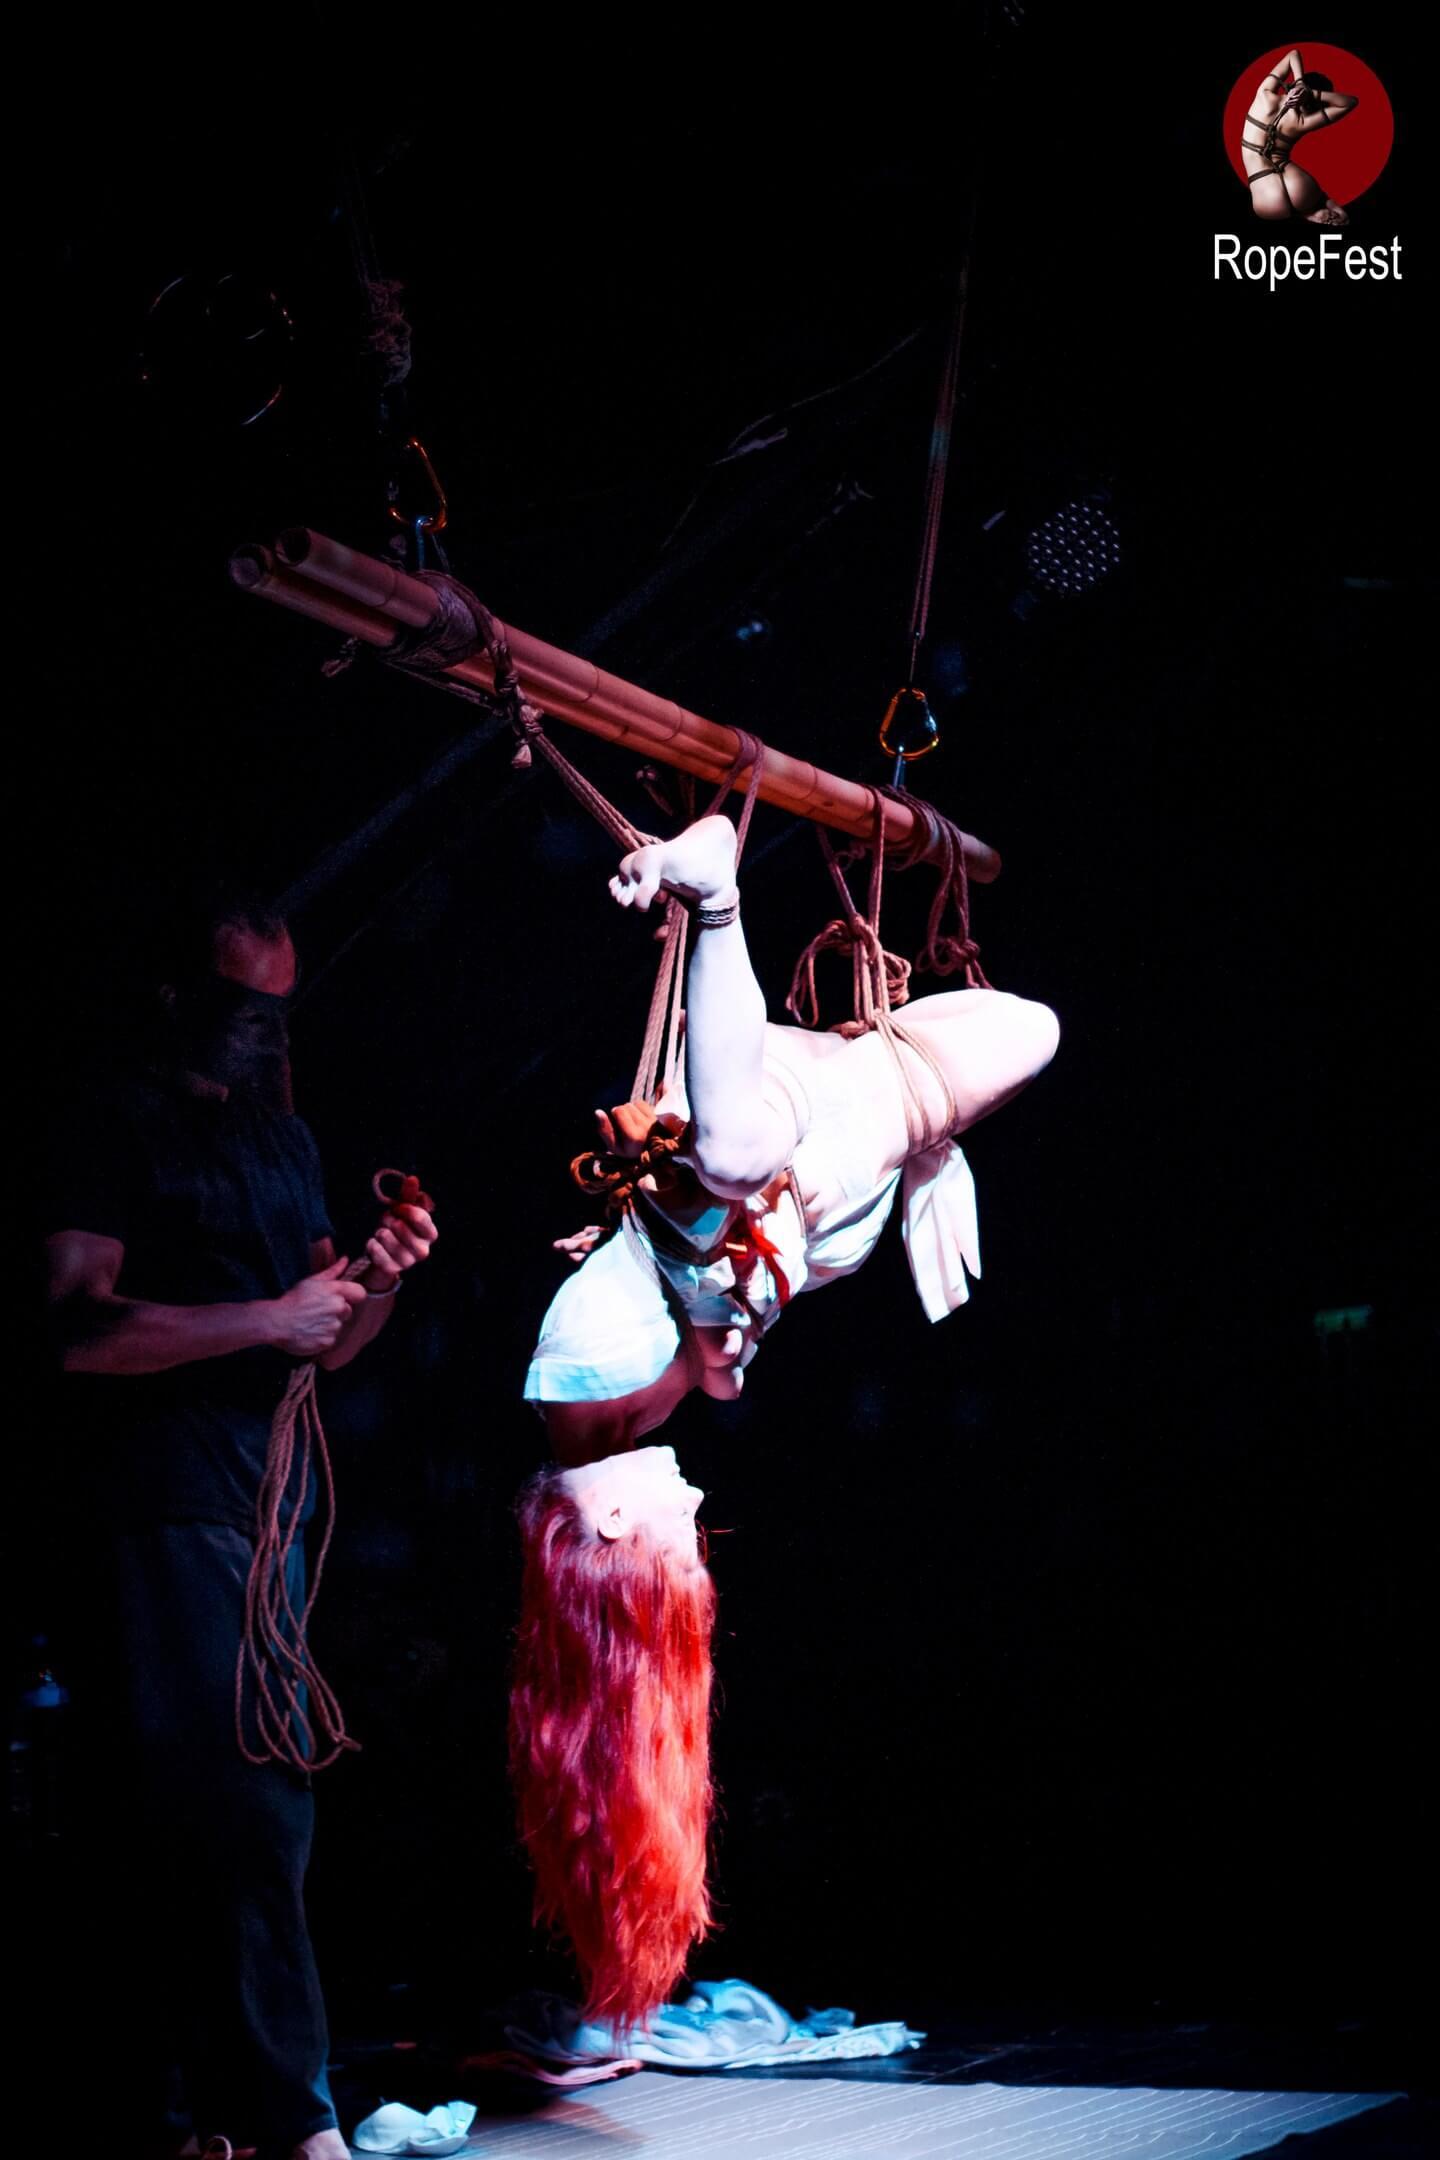 tallin-ropefest-bondage-shibari-kinbaku